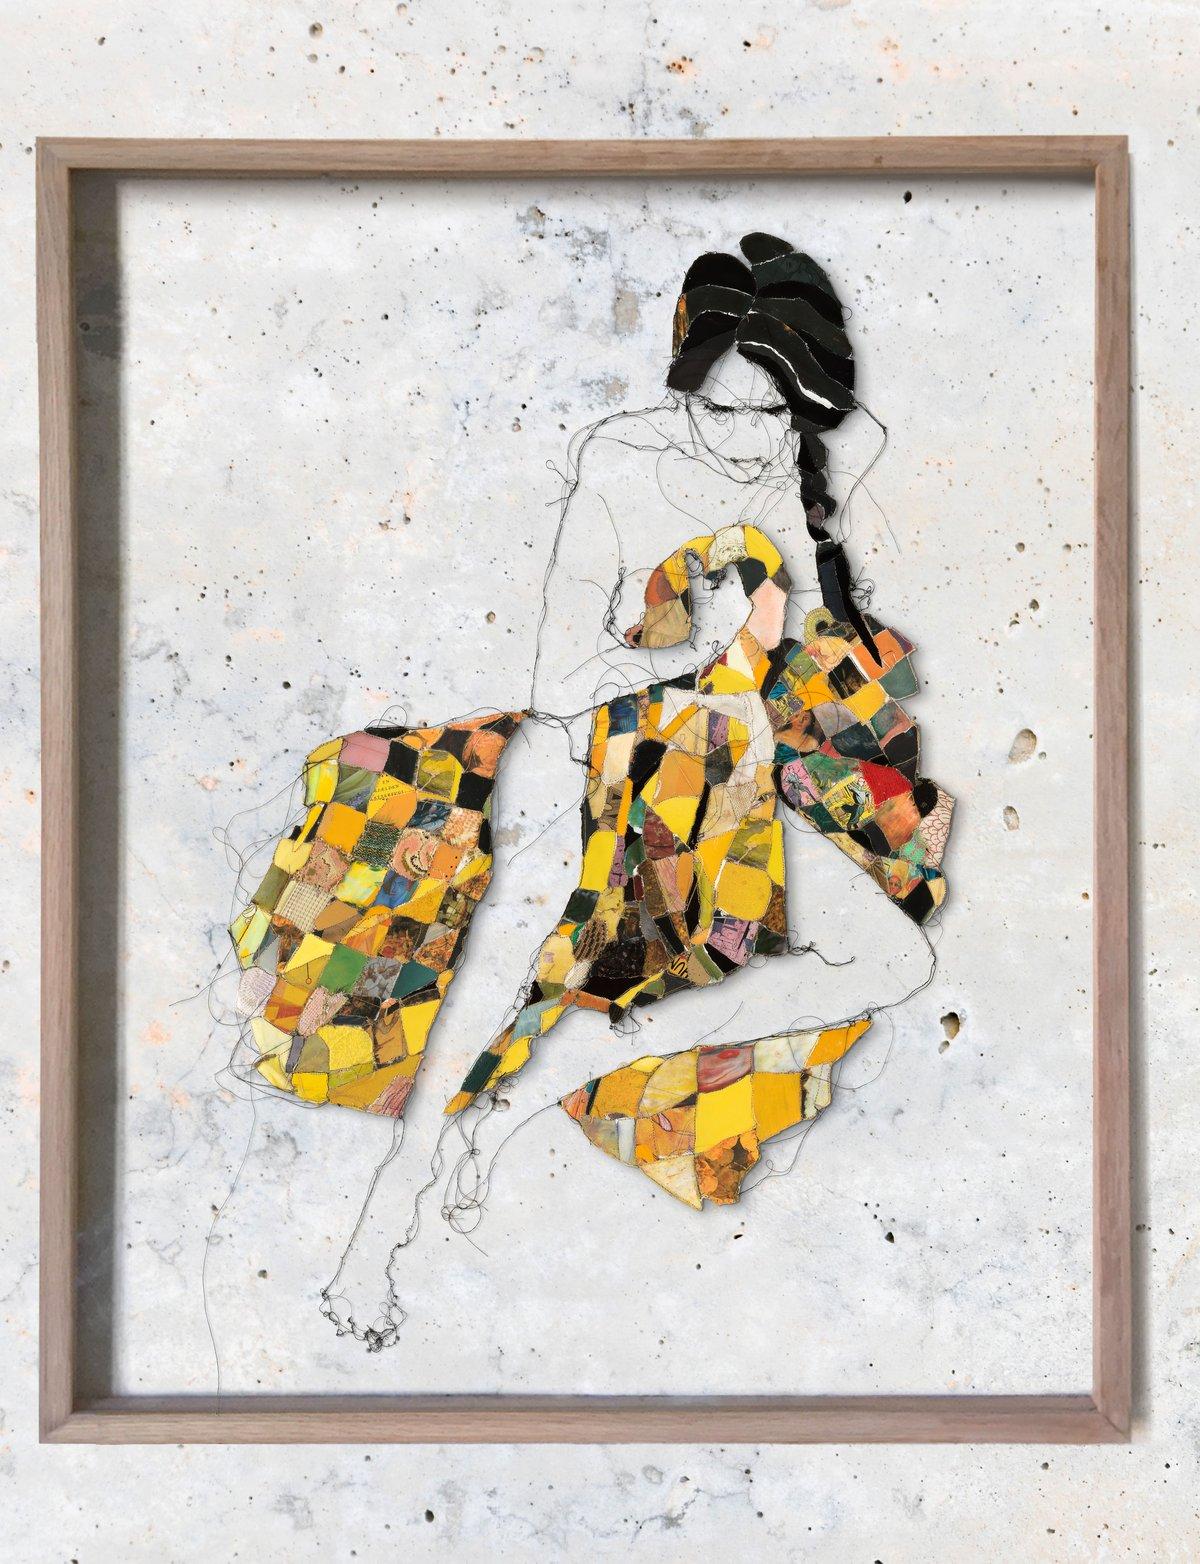 Image of Melancholic woman in yellow blanket